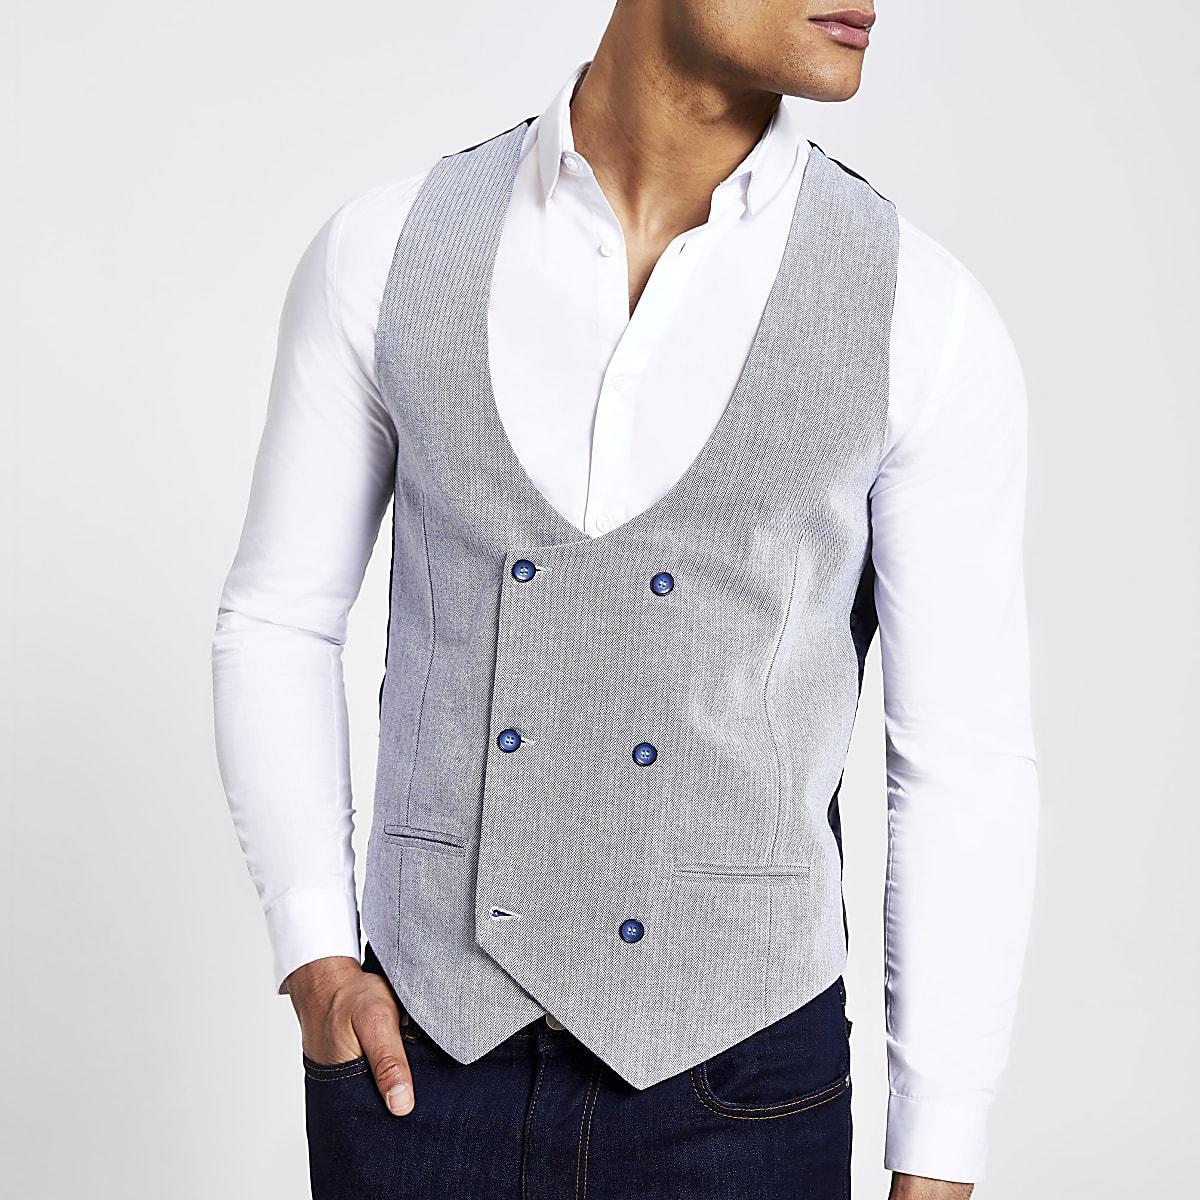 Grey Herringbone vest